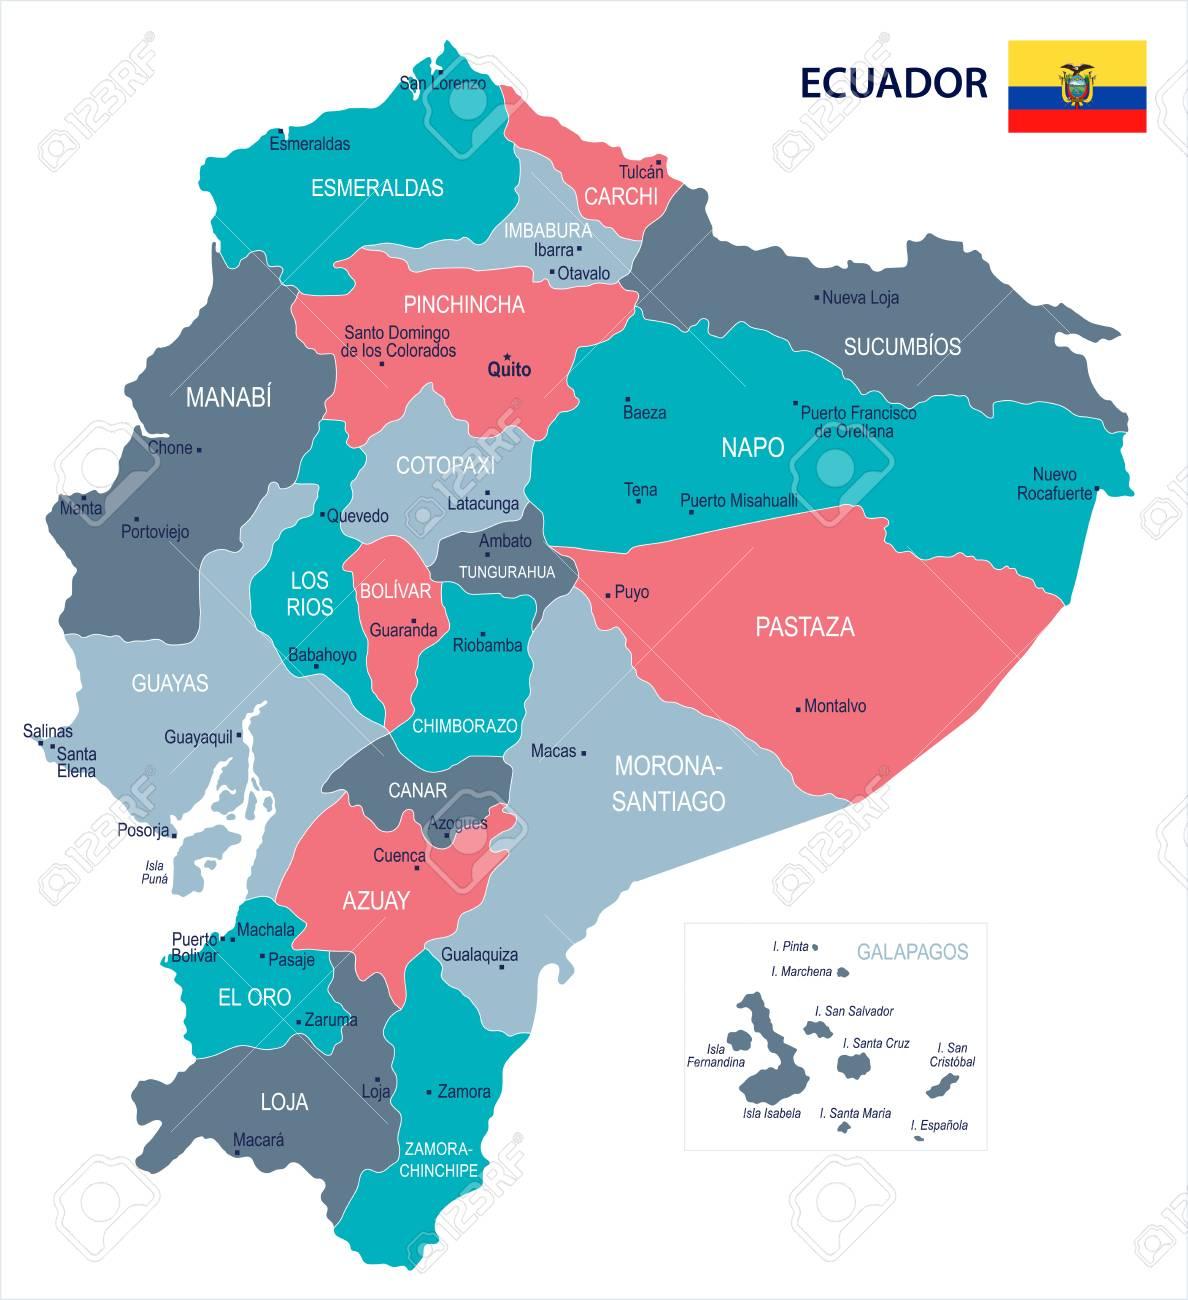 Ecuador map and flag - High Detailed Vector Illustration - 93004839